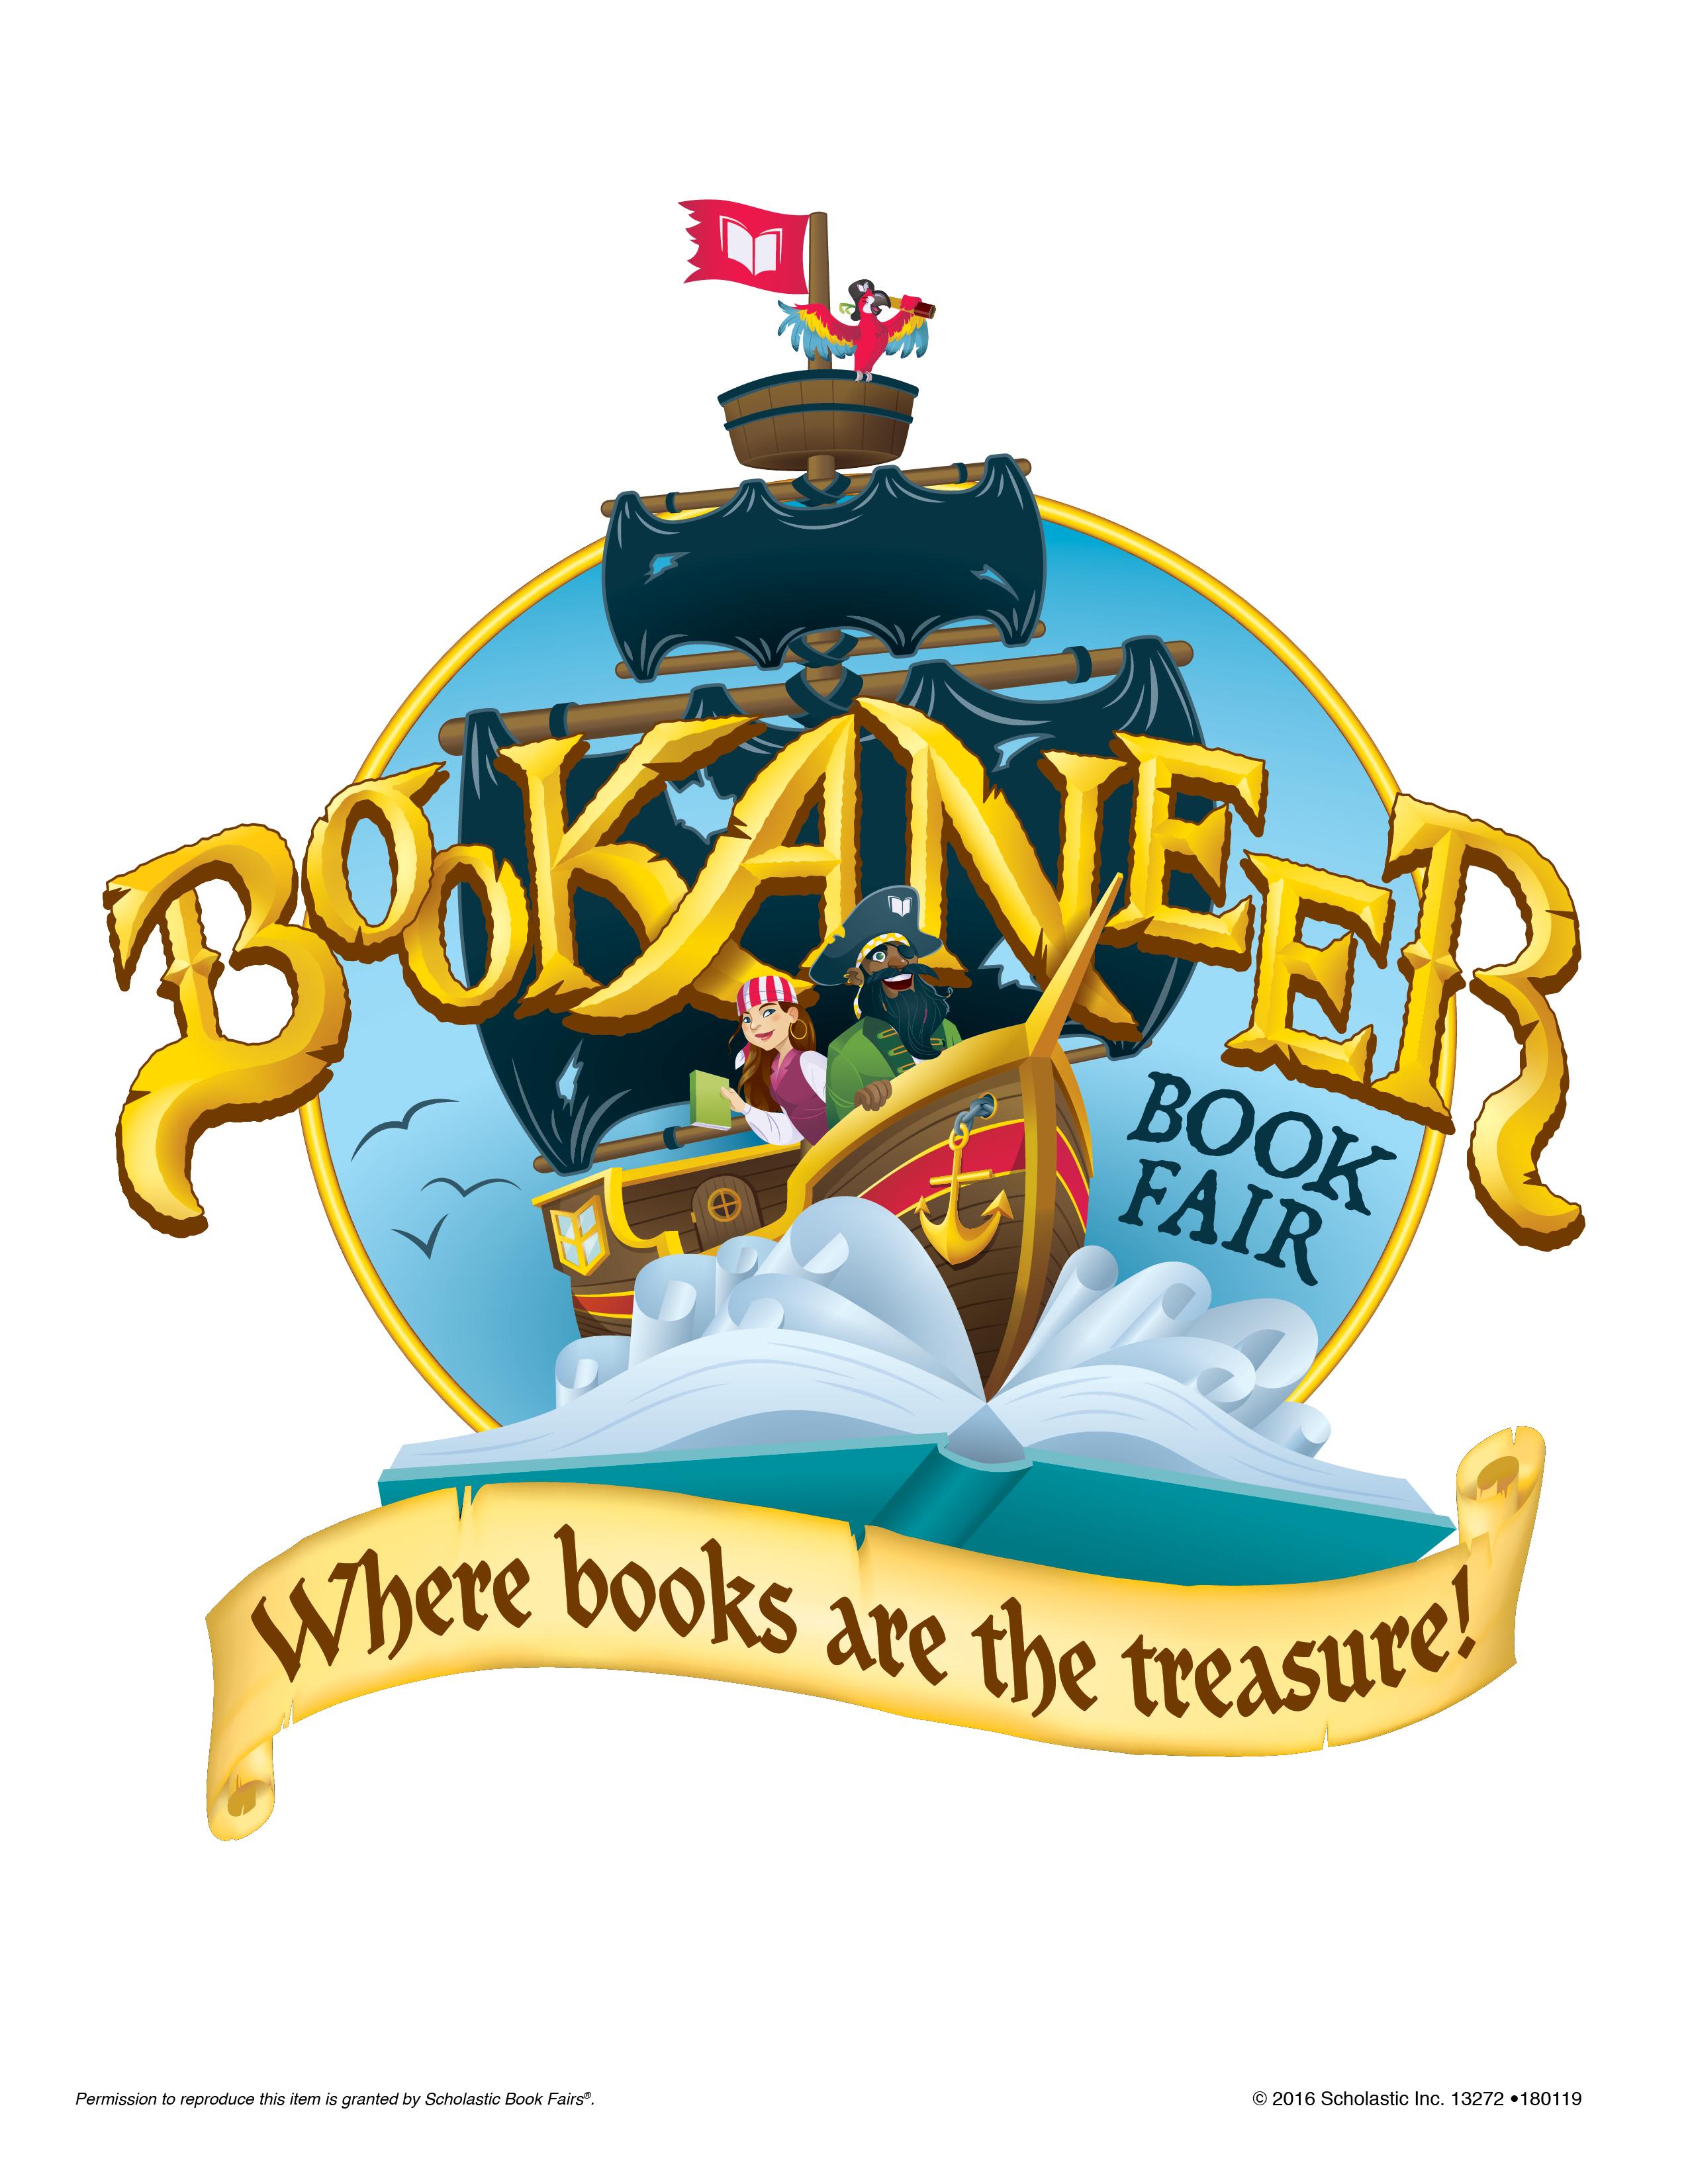 https://bookfairs.scholastic.com/bookfairs/cptoolkit/assetuploads/180119_bookaneer_book_fair_clip_art_logo.png